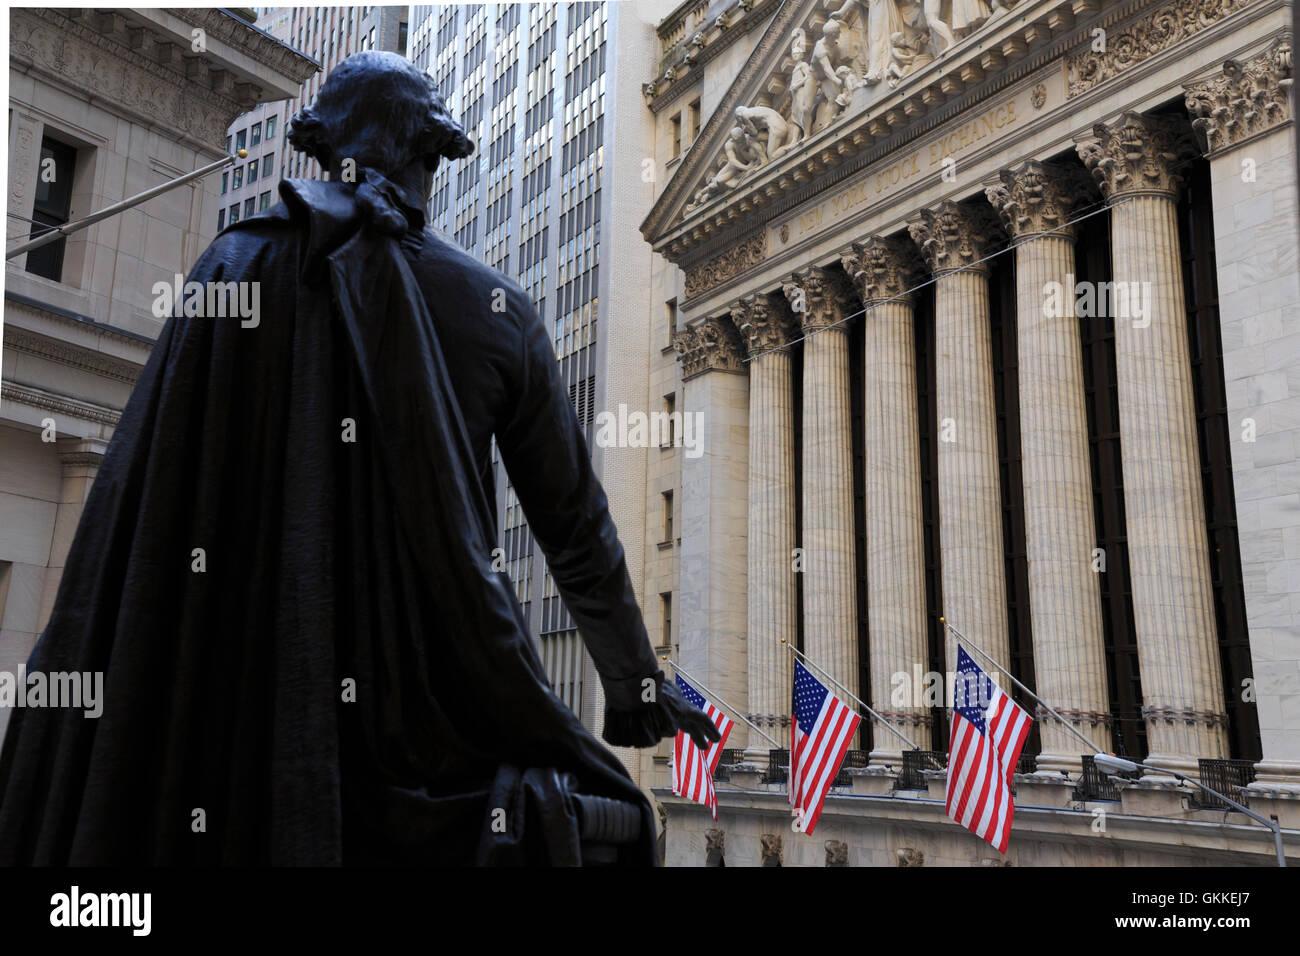 USA, New York, New York City, Lower Manhattan, Wall Street - Stock Image